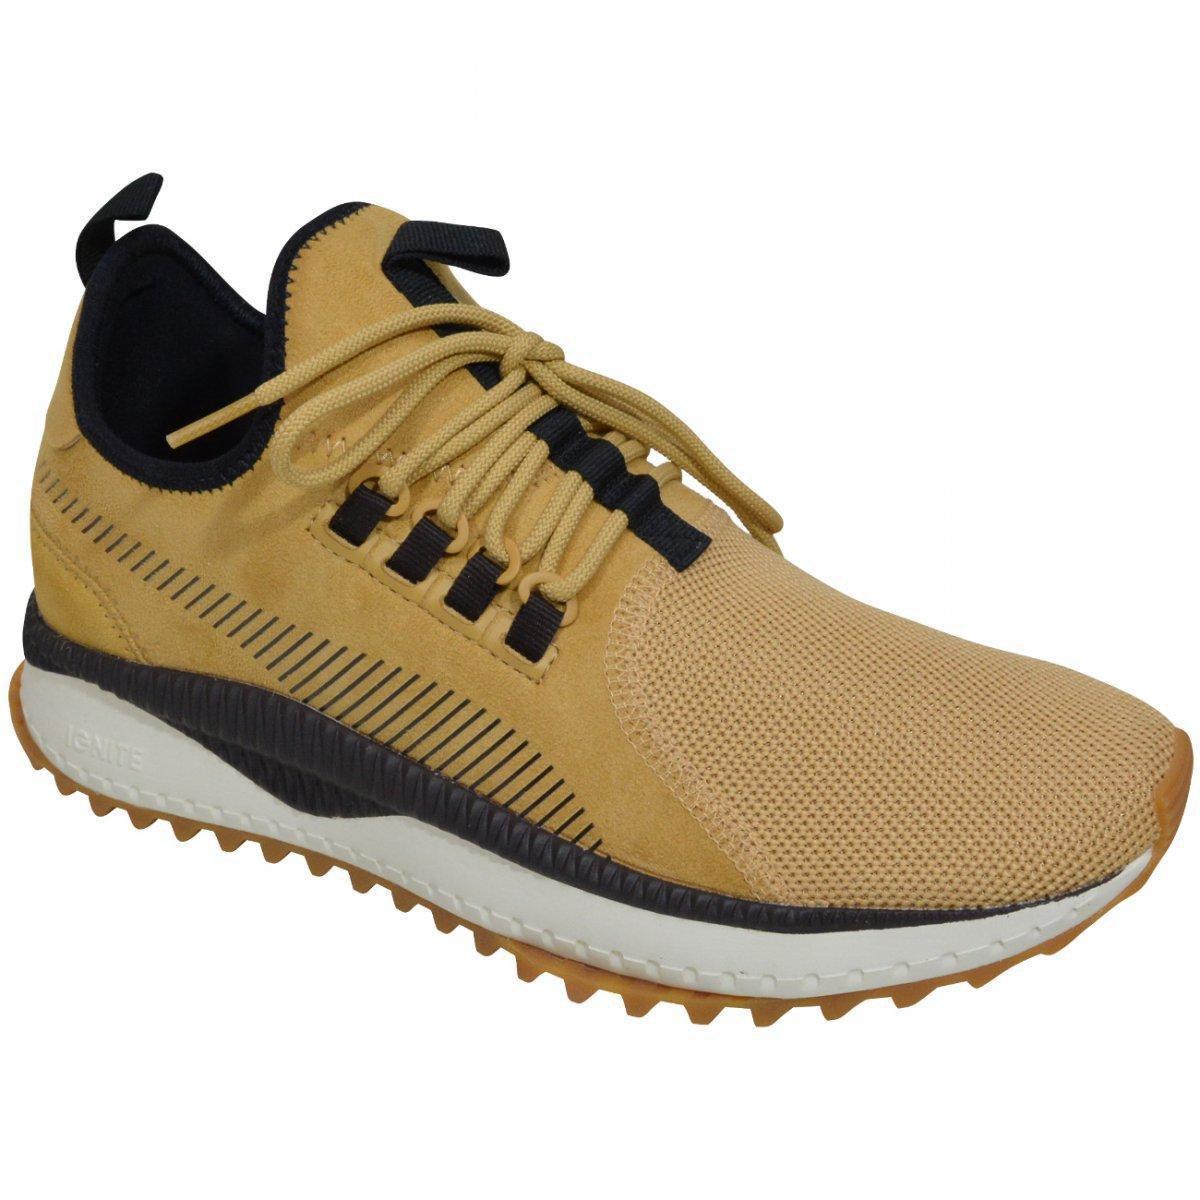 zapatos deportivos b76fc 7defe Tenis Puma Tsugi Apex Winterized Masculino - Bege